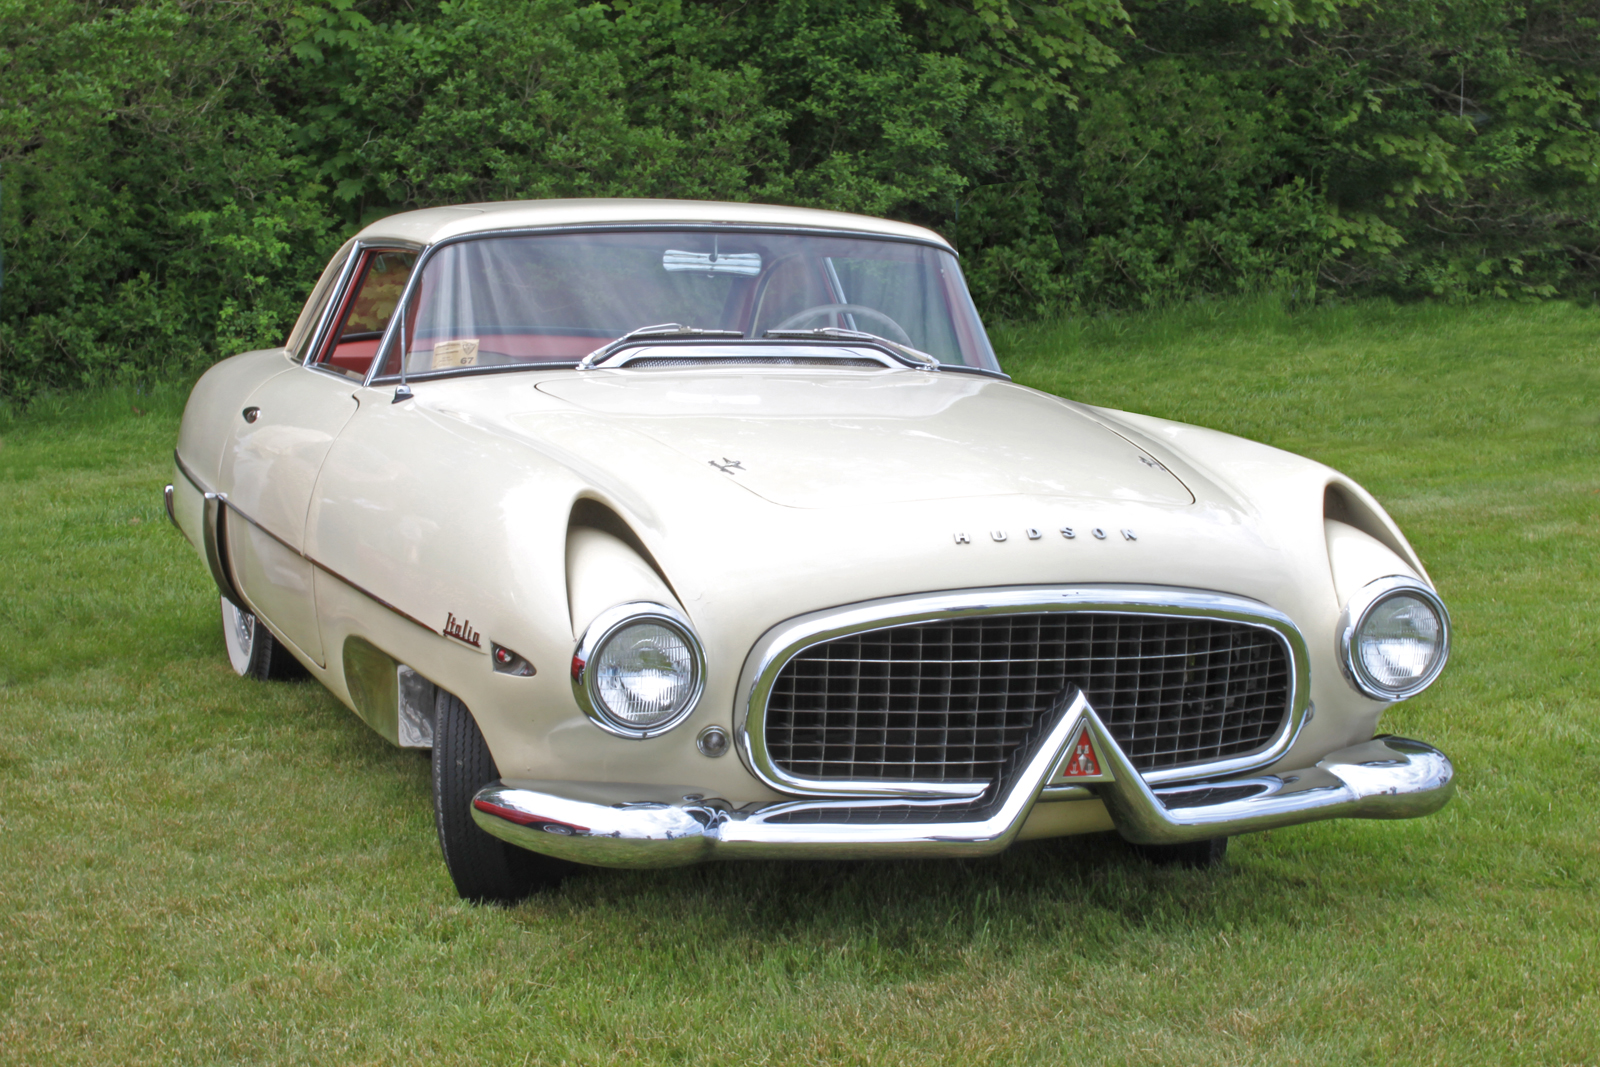 1954 Hudson Italia Superleggera. Source: farm4.static.flickr.com